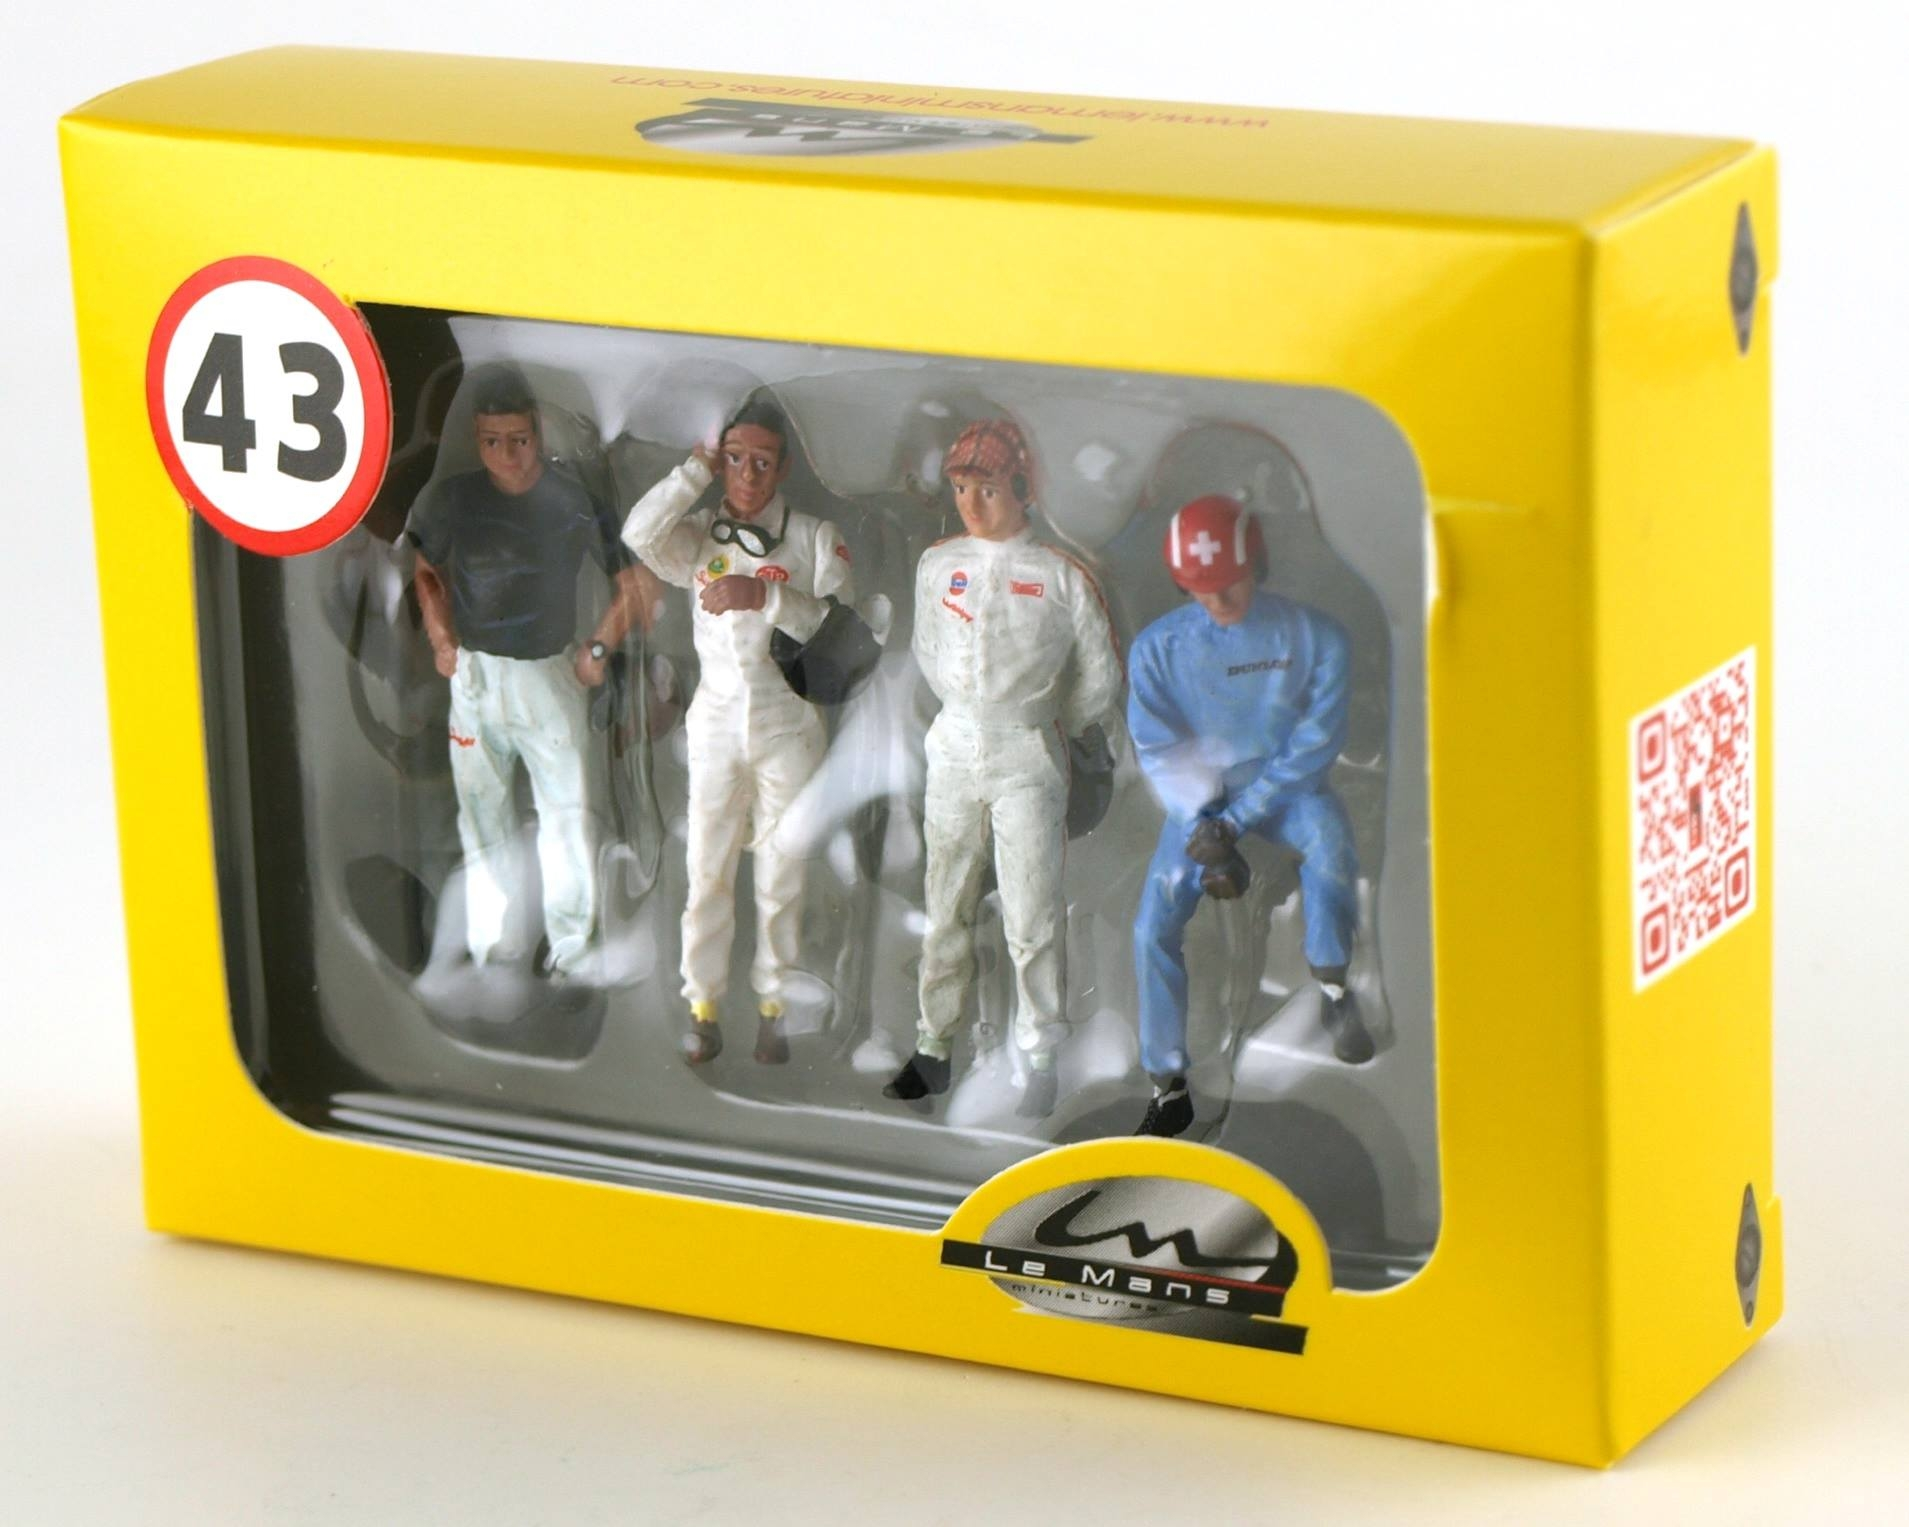 Coffret de 4 figurines peintes Fangio, J.Clark, P.Rodriguez&Jo Siffert - Echelle 1/43 - ref. COFLM143001M